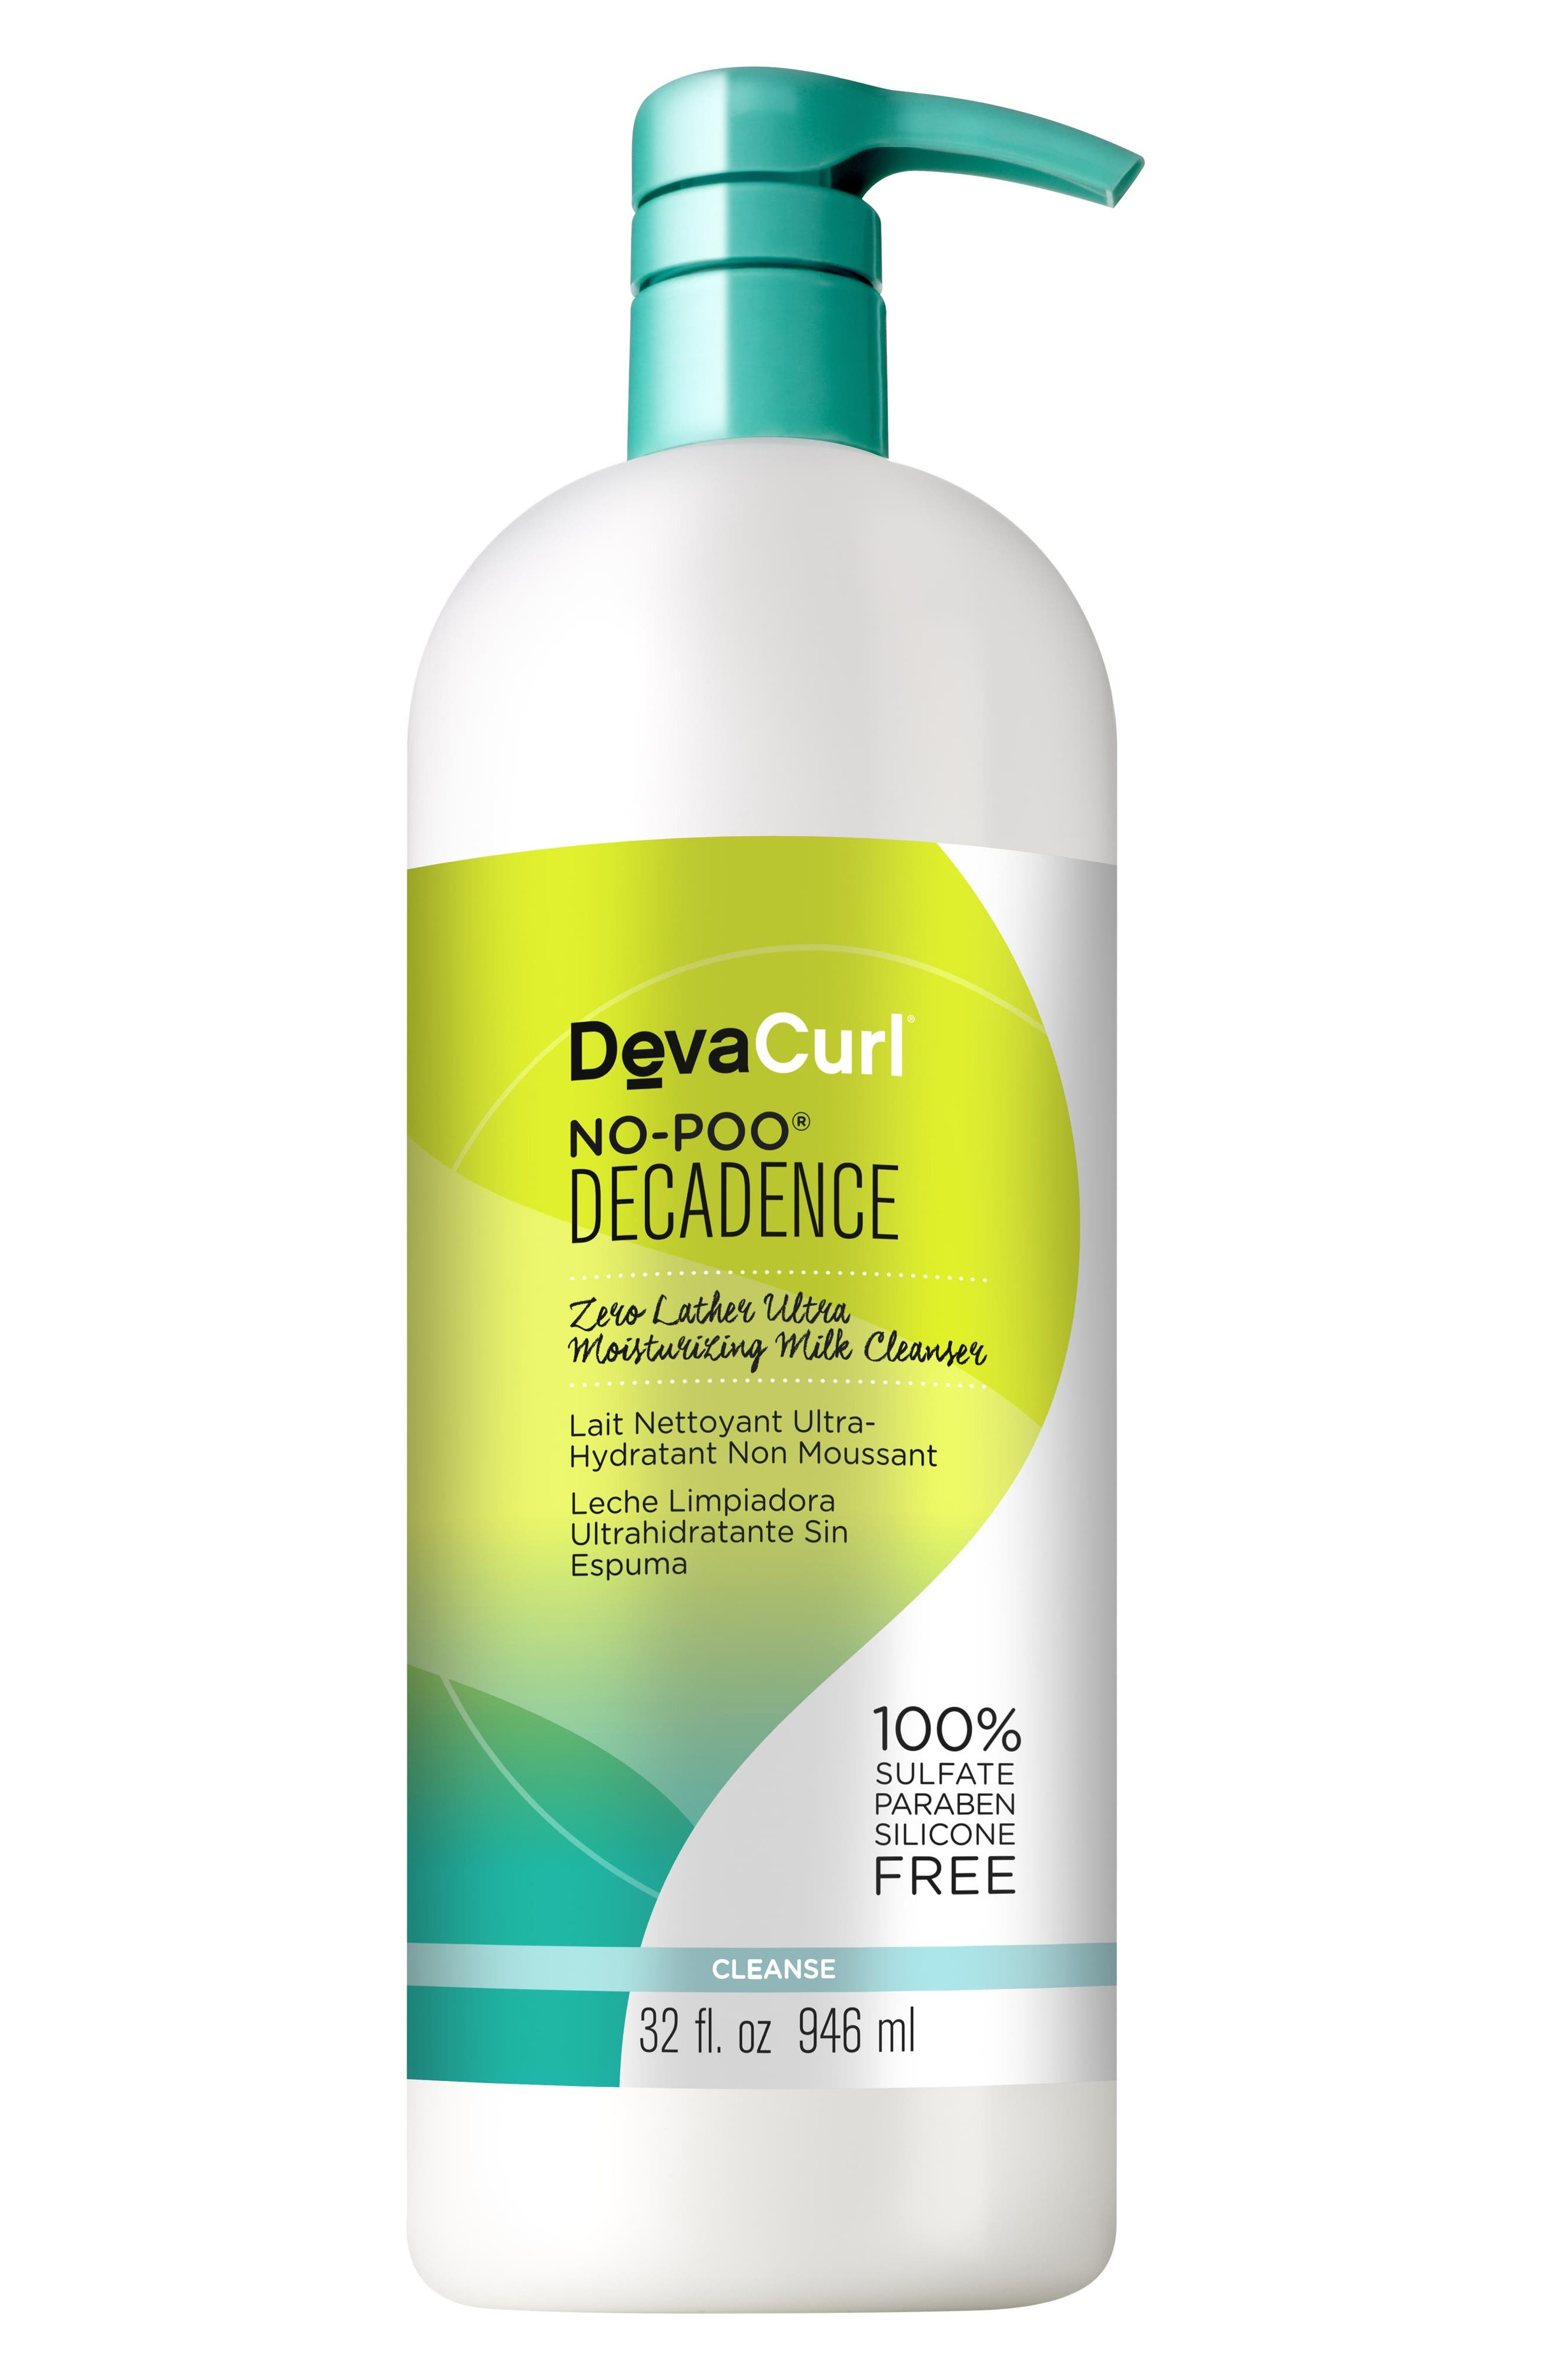 DevaCurl No-Poo® Decadence Zero Lather Ultra Moisturizing Milk Cleanser